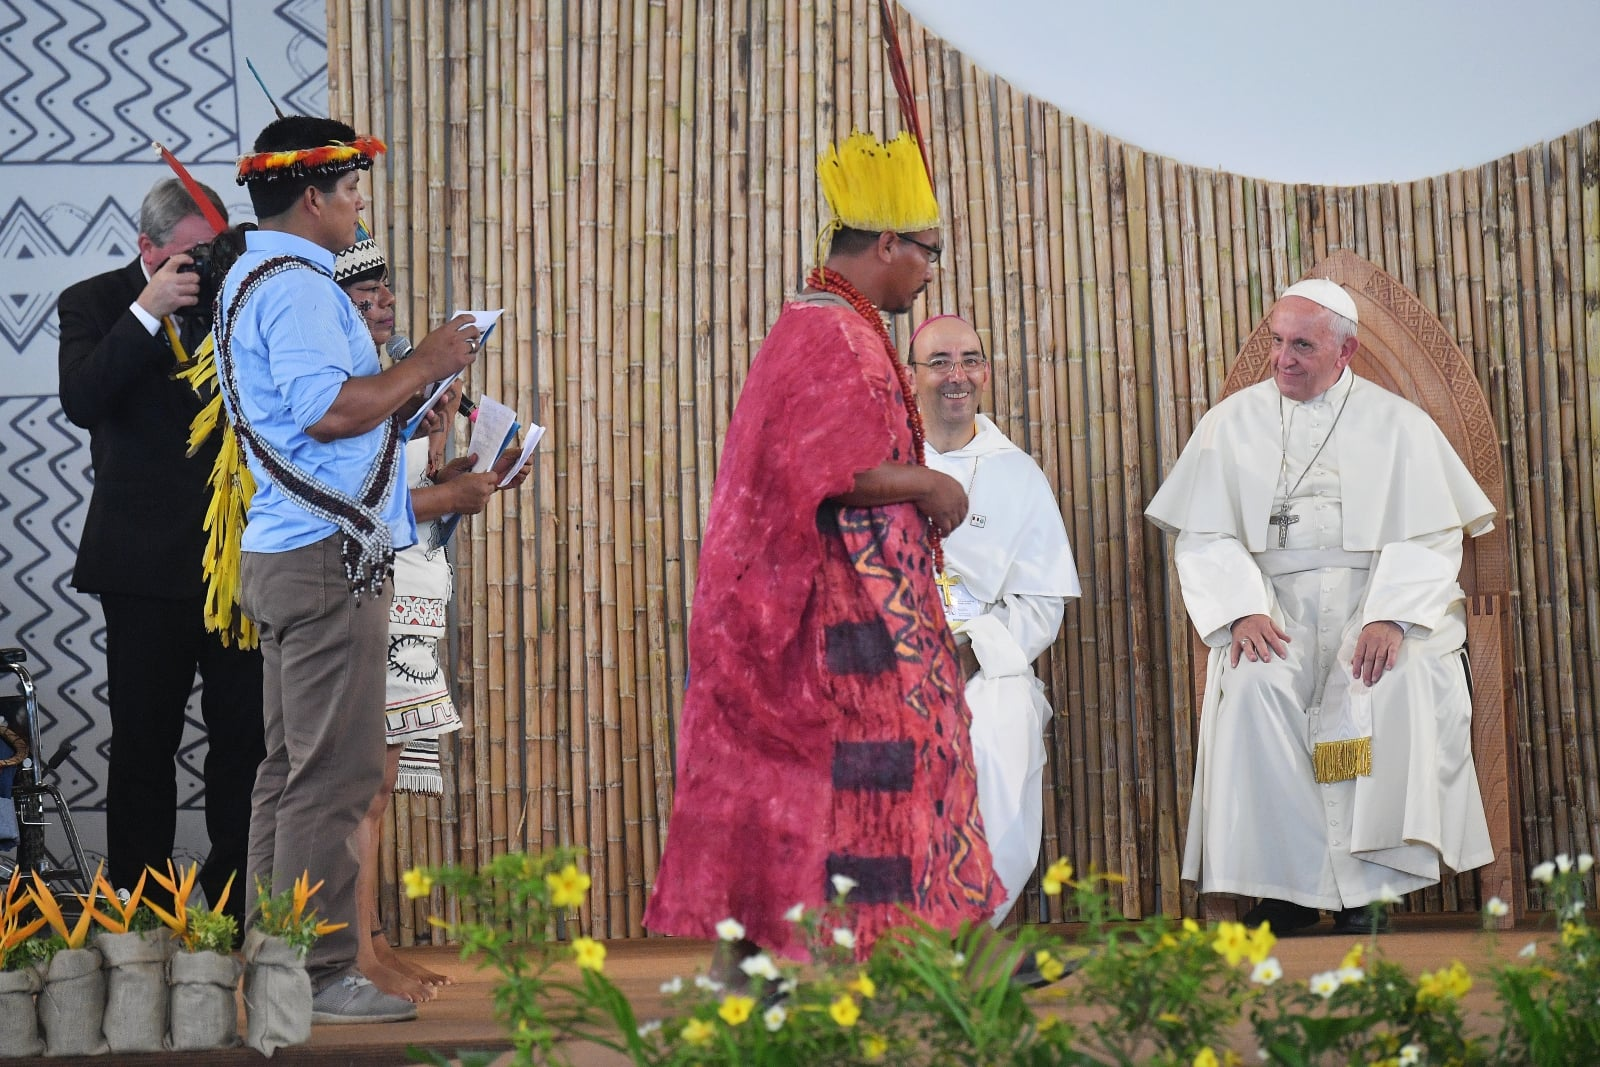 Papież Franciszek w Peru  EPA/LUCA ZENNARO